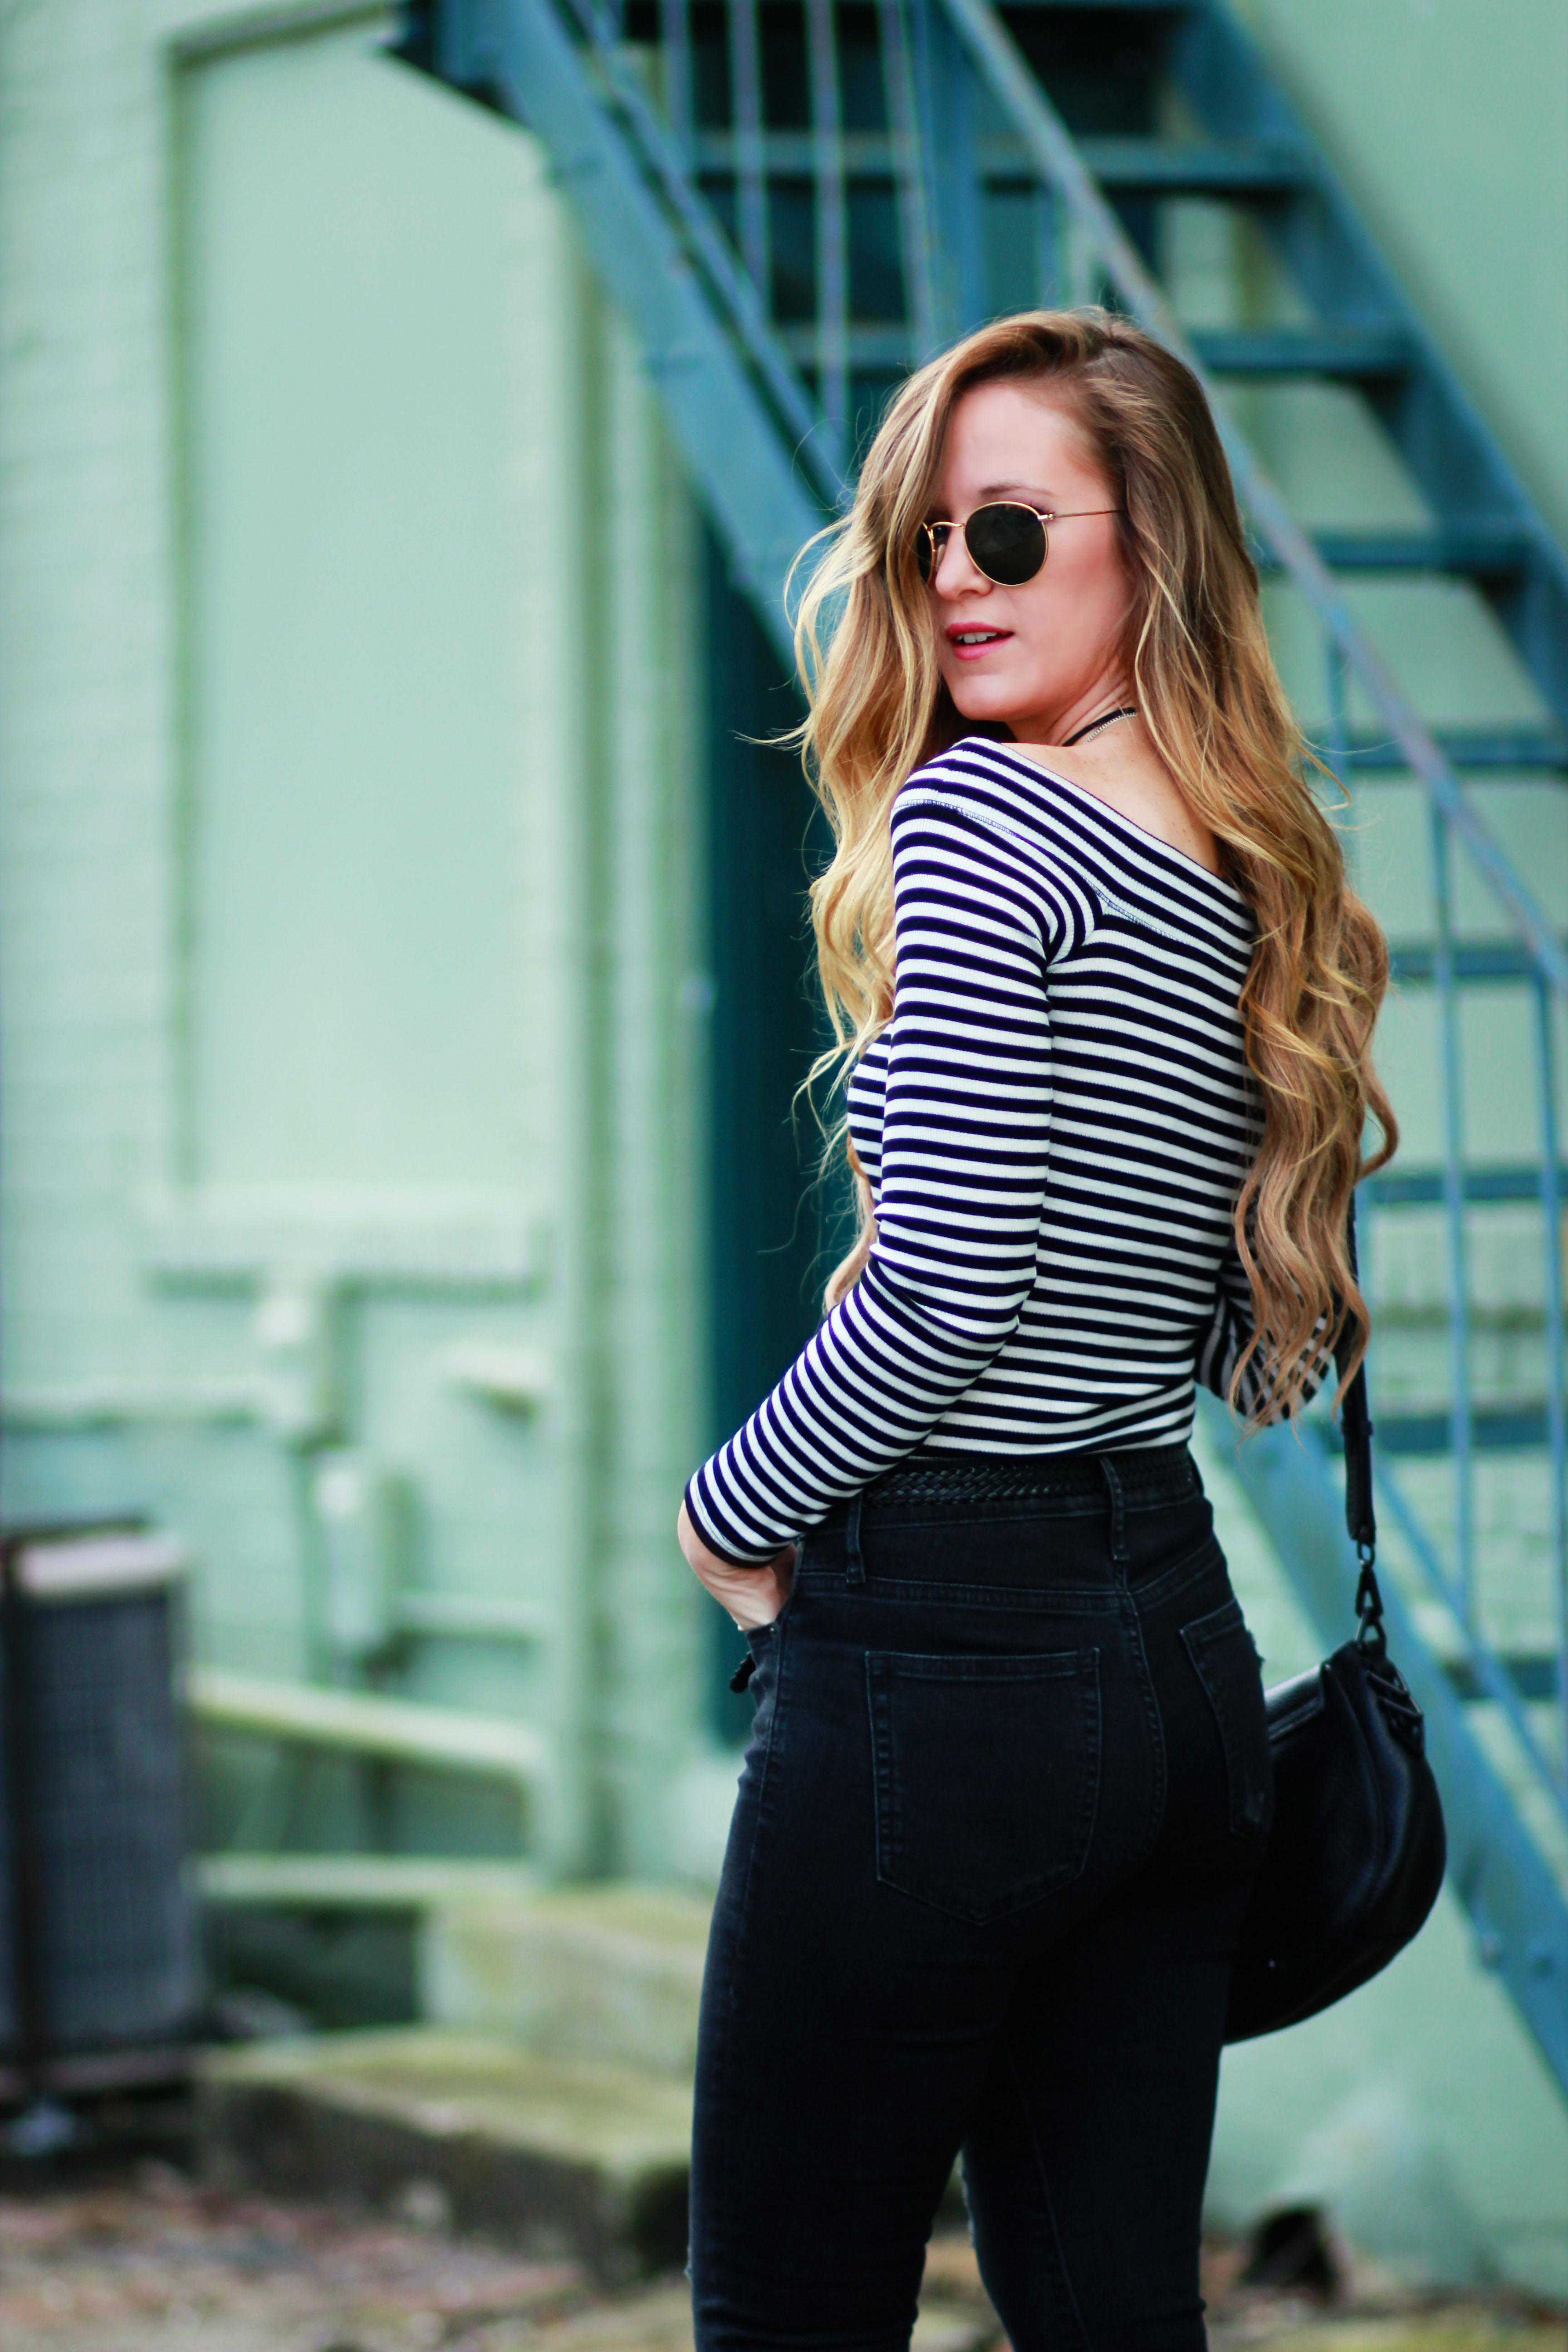 27da5501ee3 Orlando Florida fashion blogger styles Hollister off the shoulder top, Gap  flared black jeans,